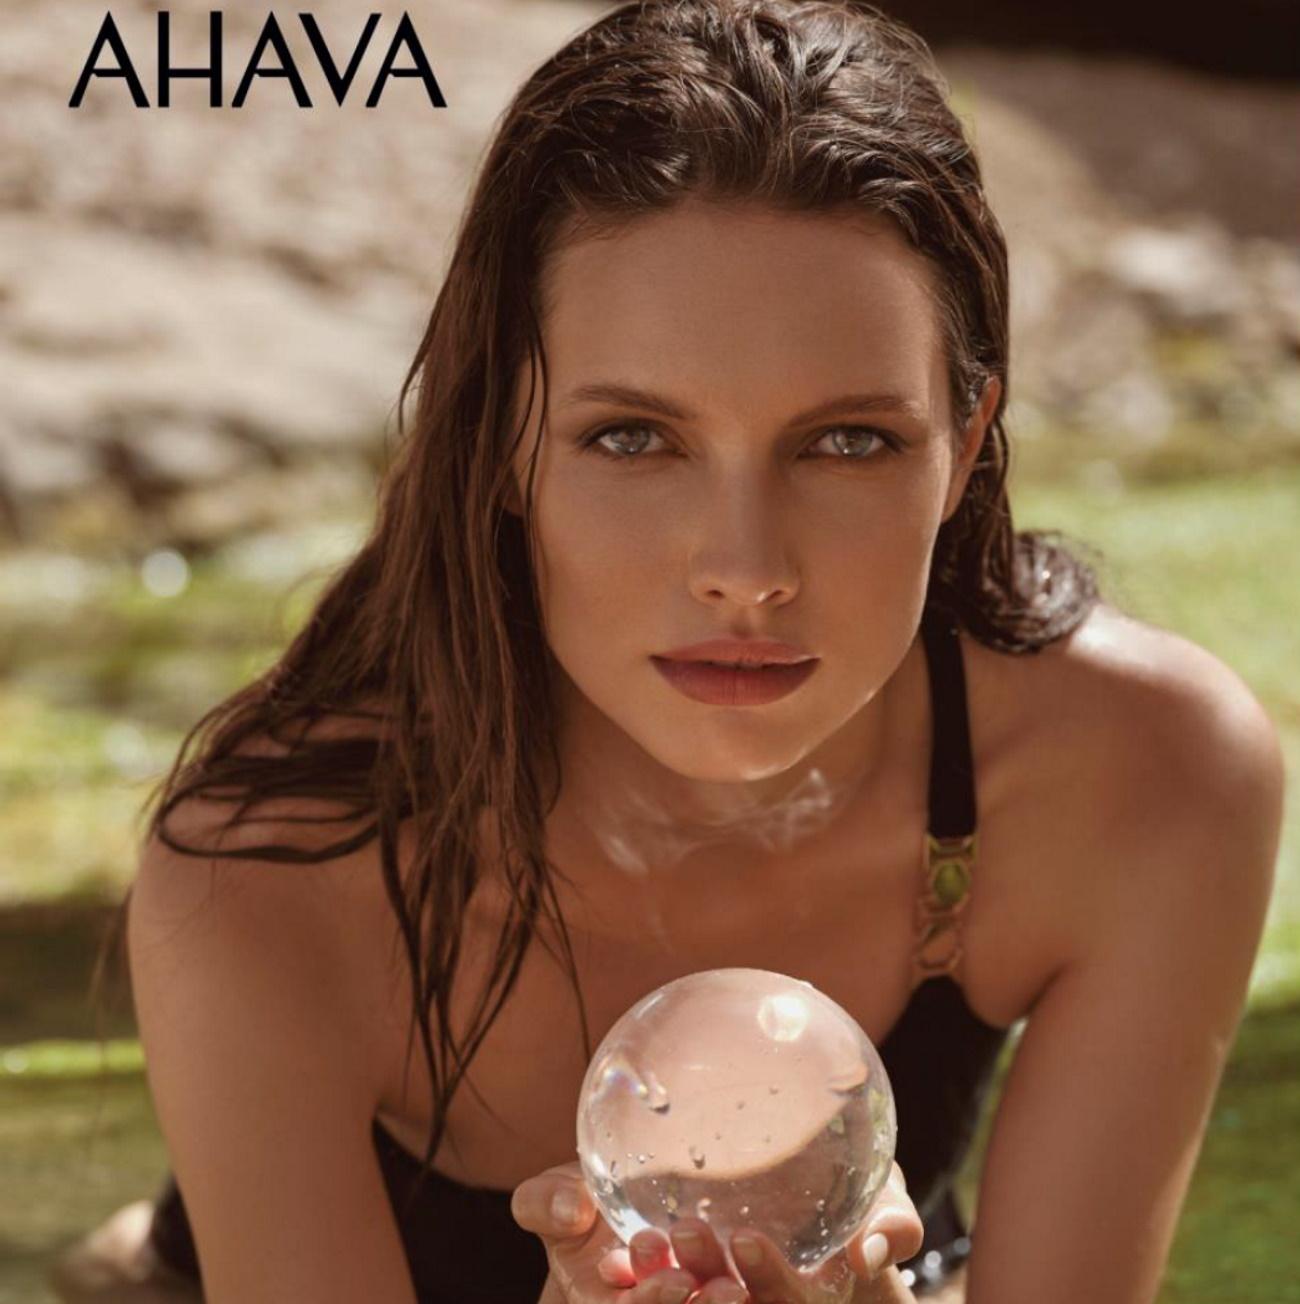 Persbericht: AHAVA pRetinol skincare